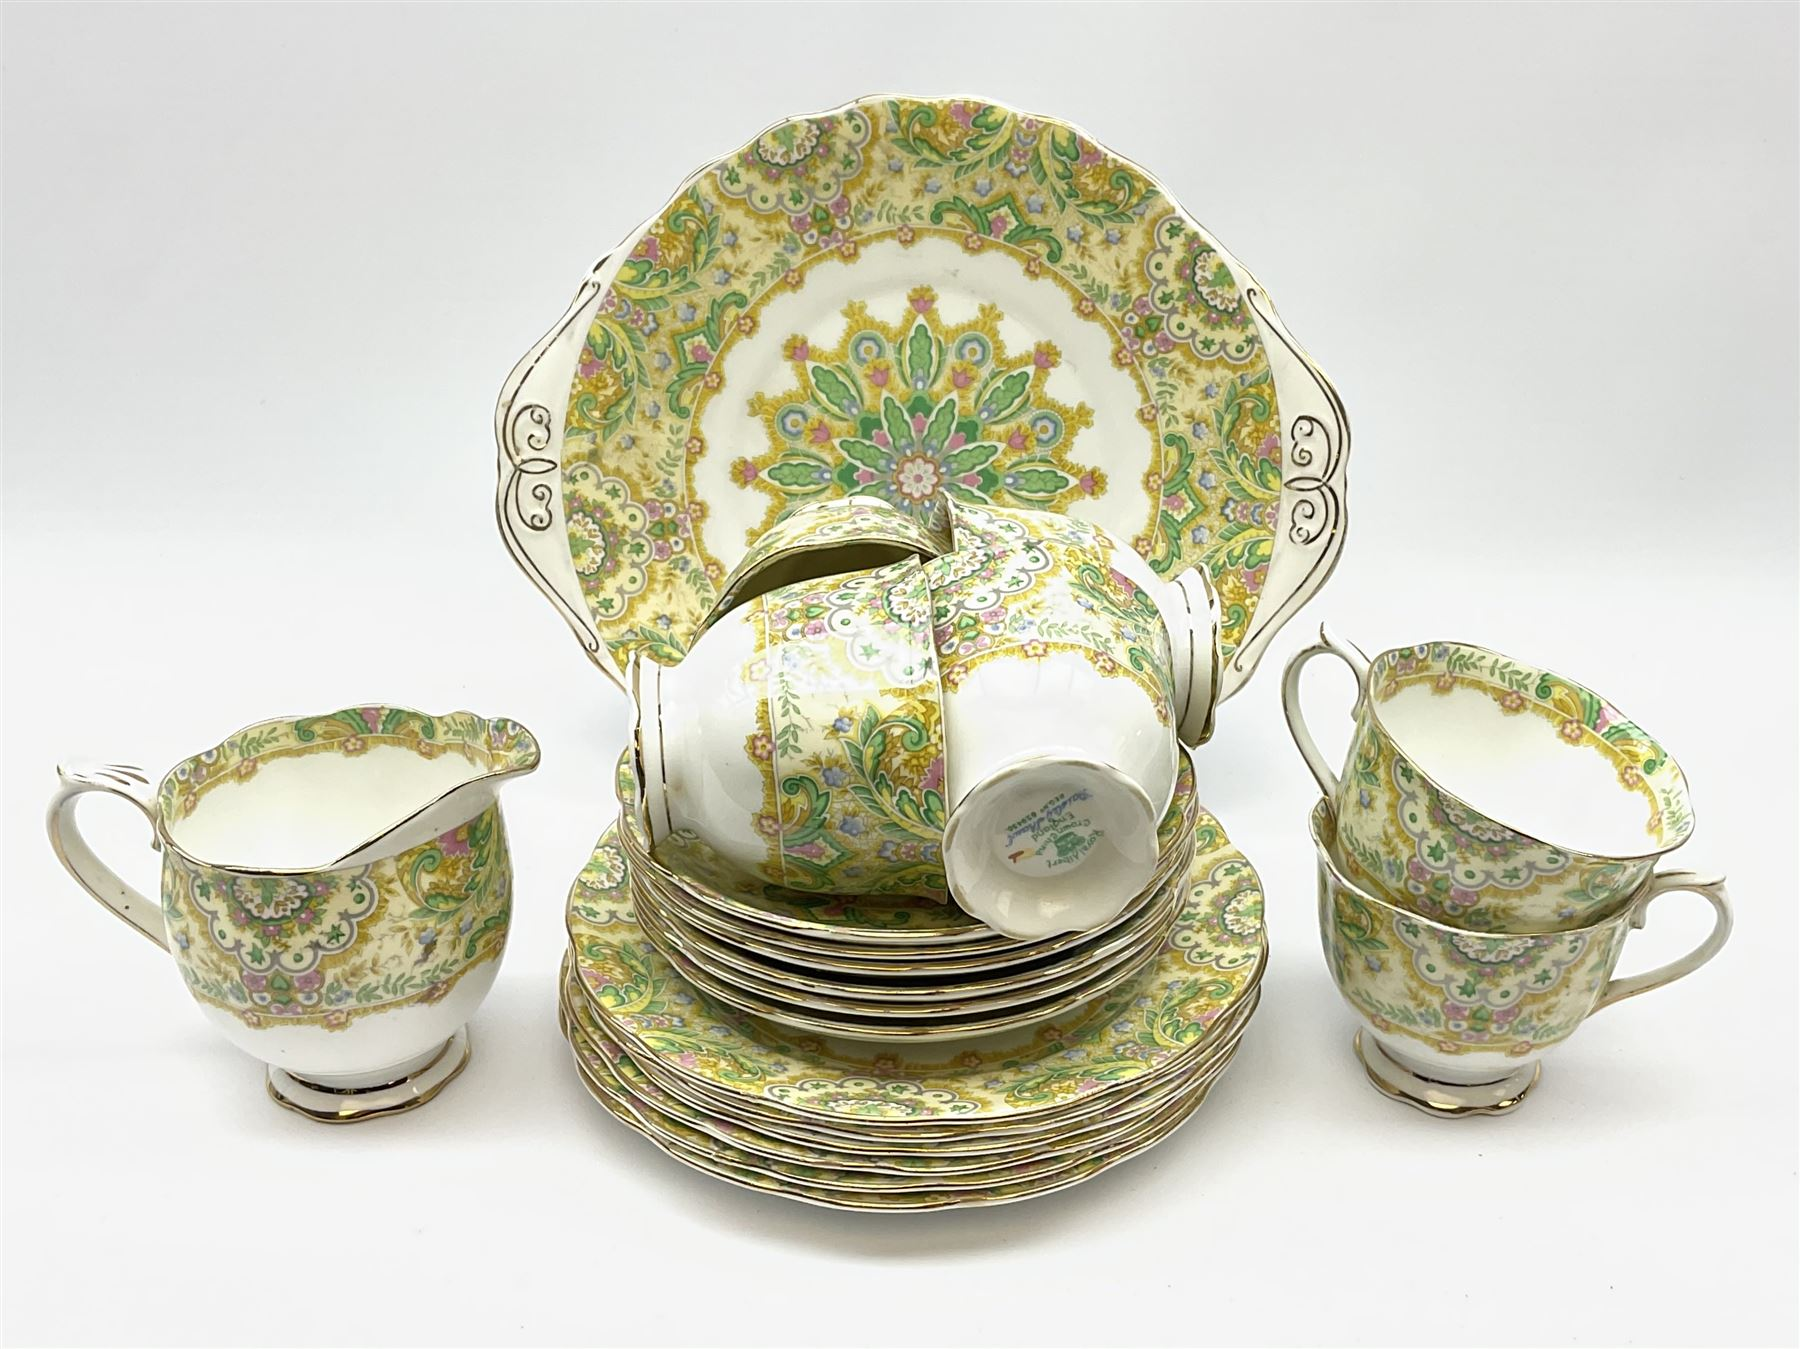 Royal Albert 'Paisley Shawl' pattern part tea set